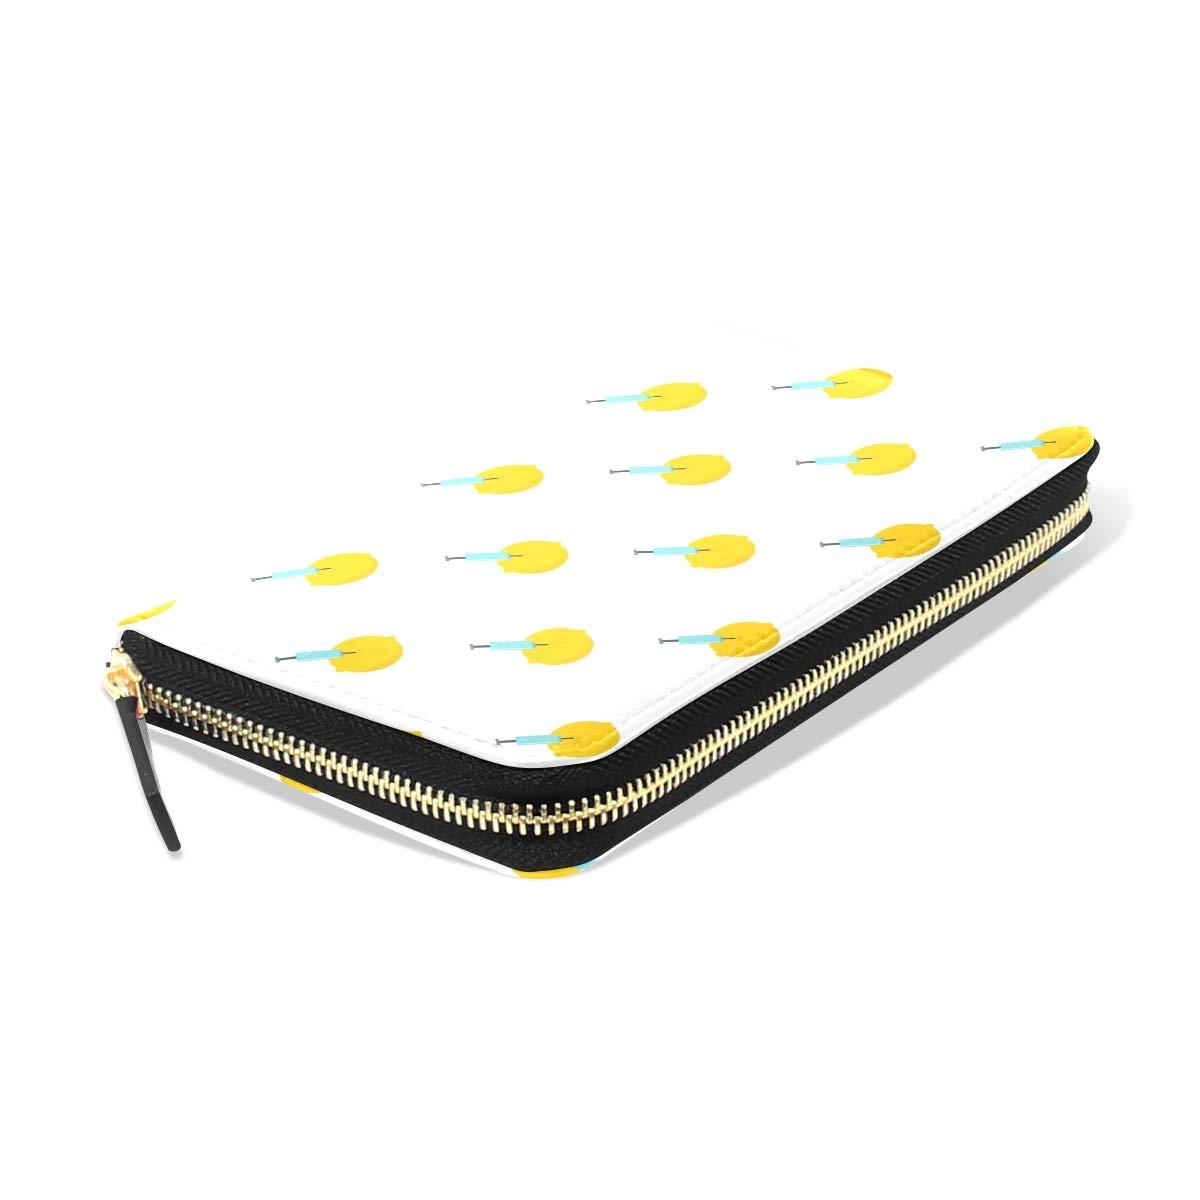 Women Injection Of Yellow Lemon Leather Wallet Large Capacity Zipper Travel Wristlet Bags Clutch Cellphone Bag